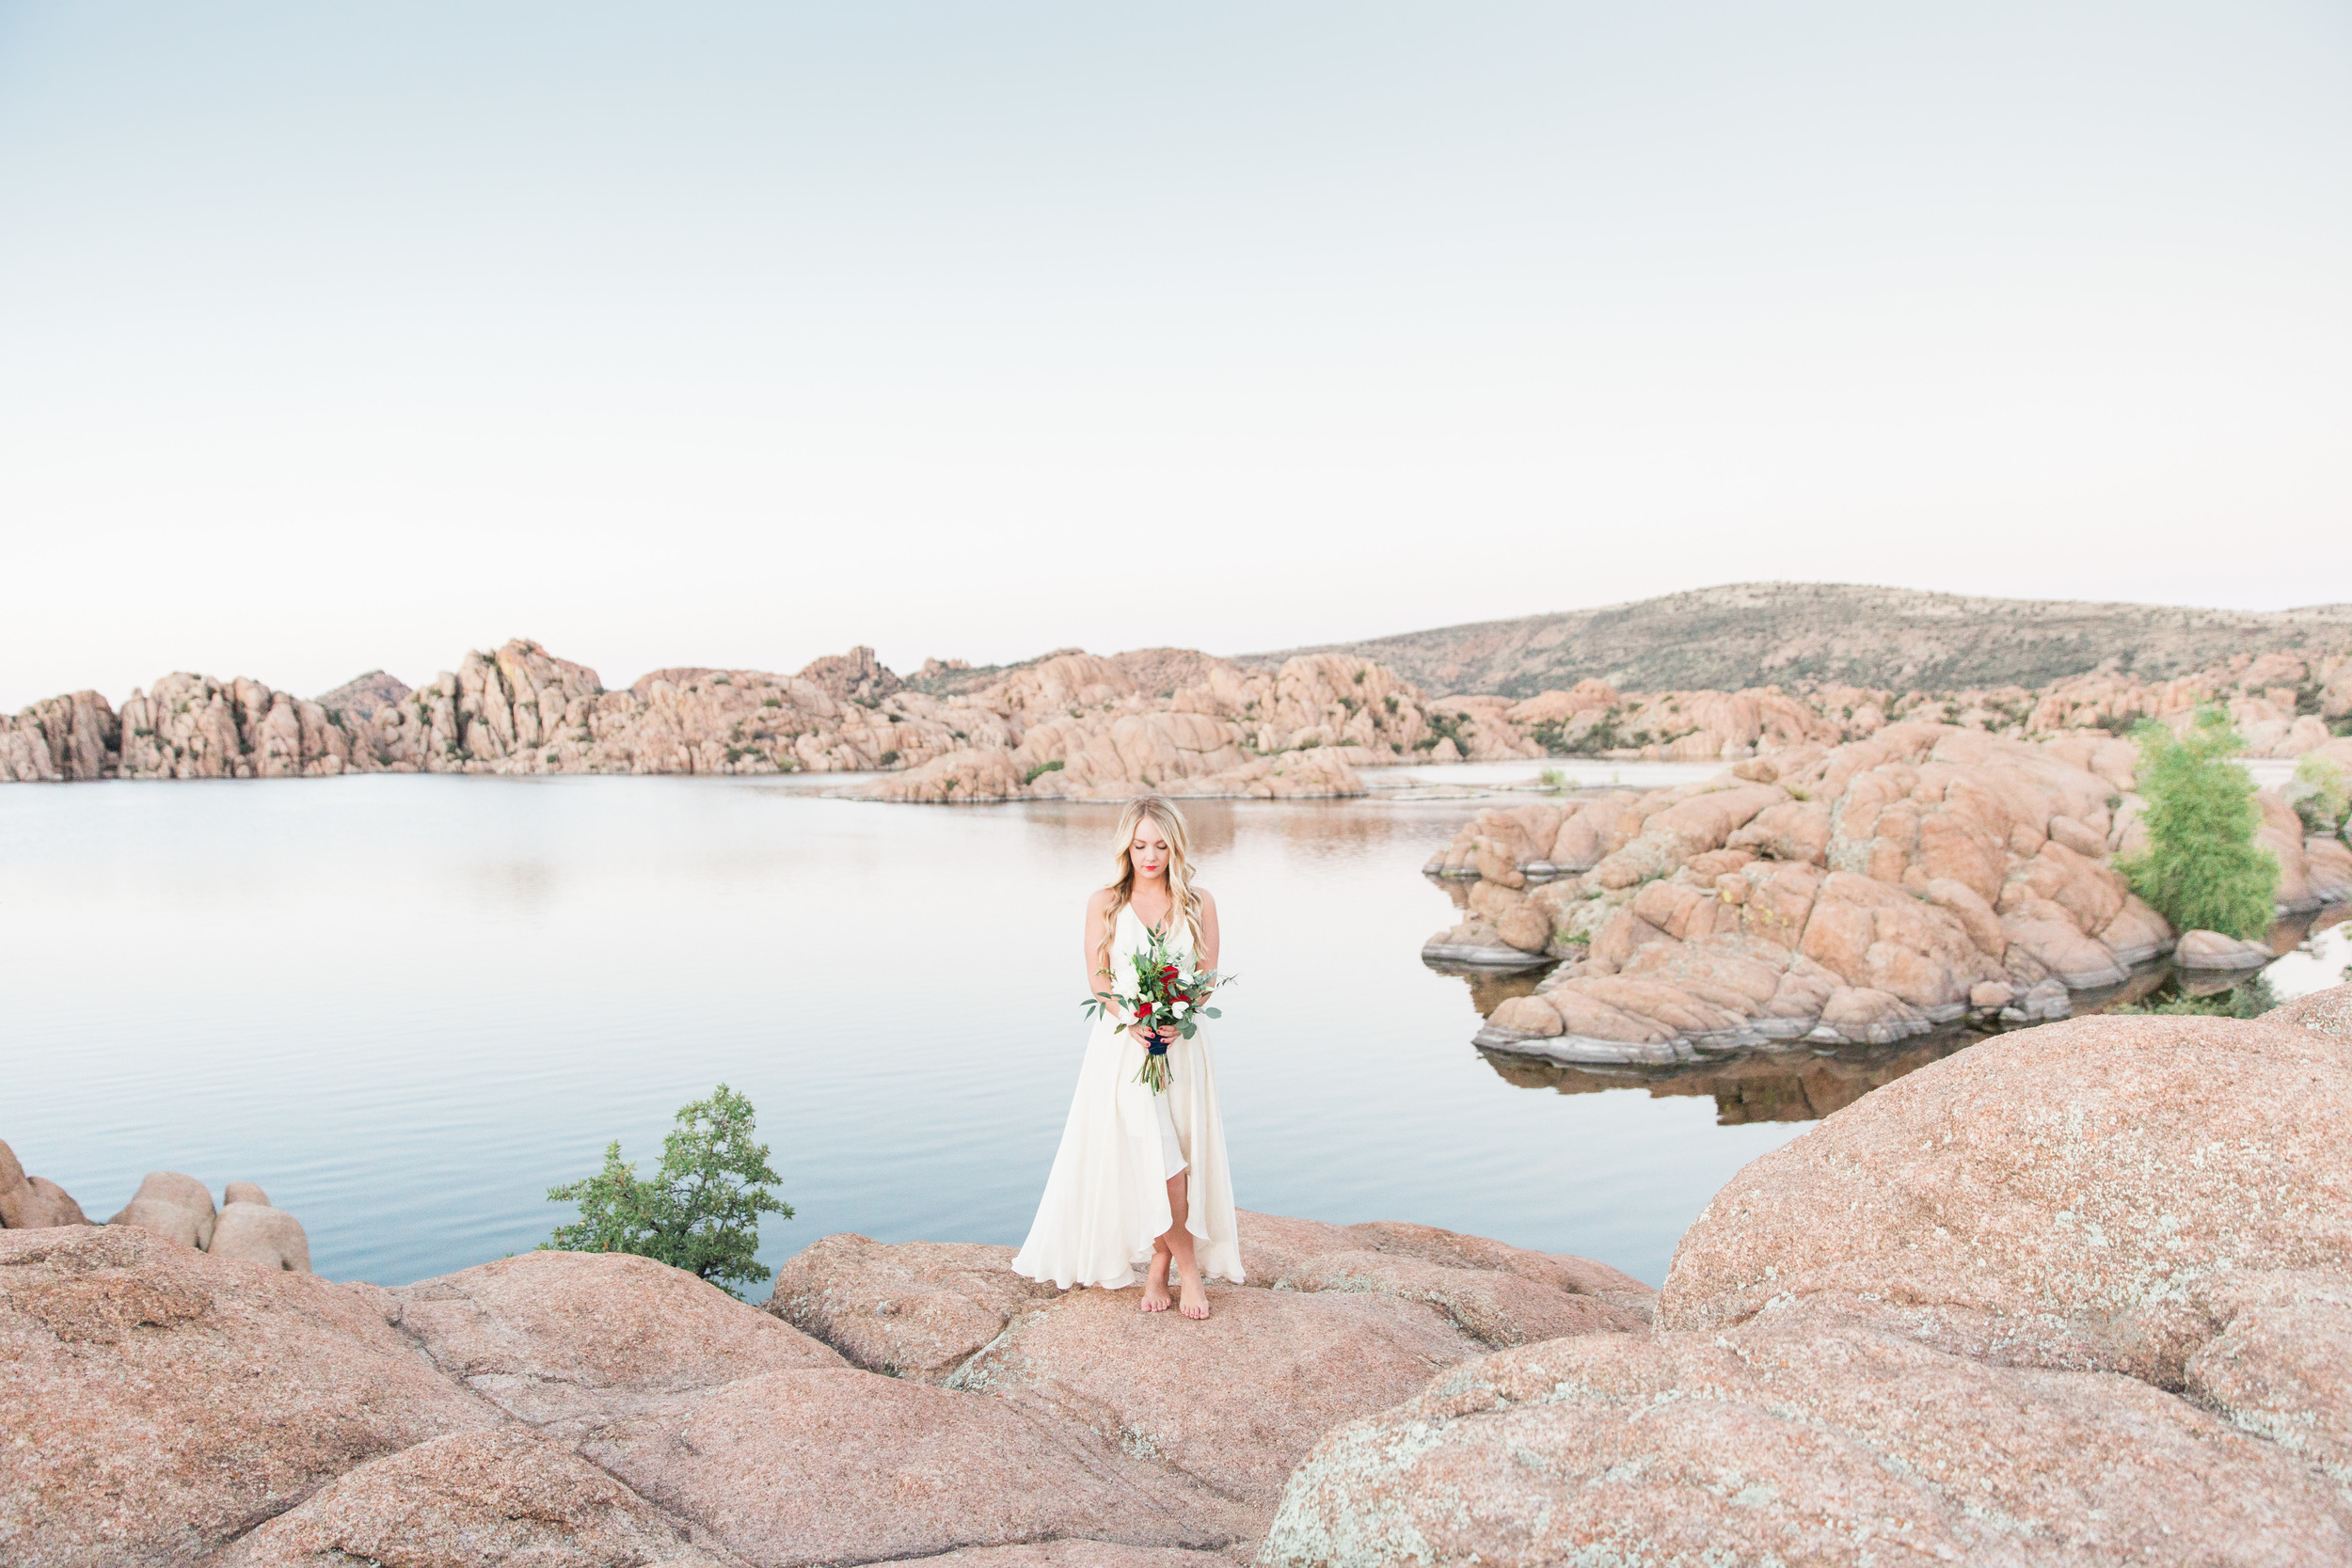 4th of July Styled Elopement   Prescott Wedding Photographers   See more at BetsyandJohn.com